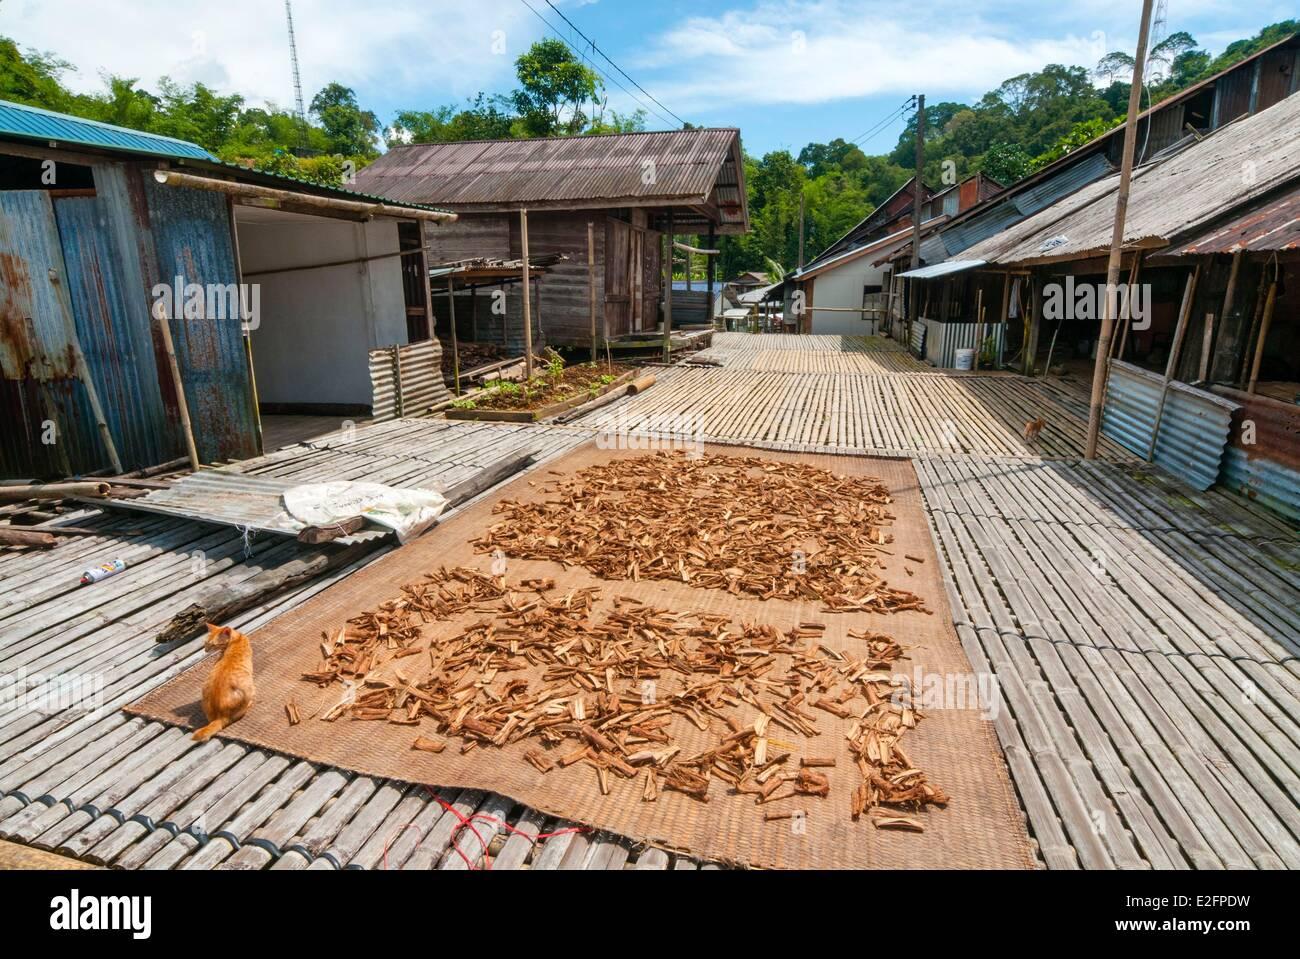 Malaysia Malaysian Borneo Sarawak Stato Kuching Annah Rais Bidayuh longhouse corteccia di China (China officinalis) Immagini Stock